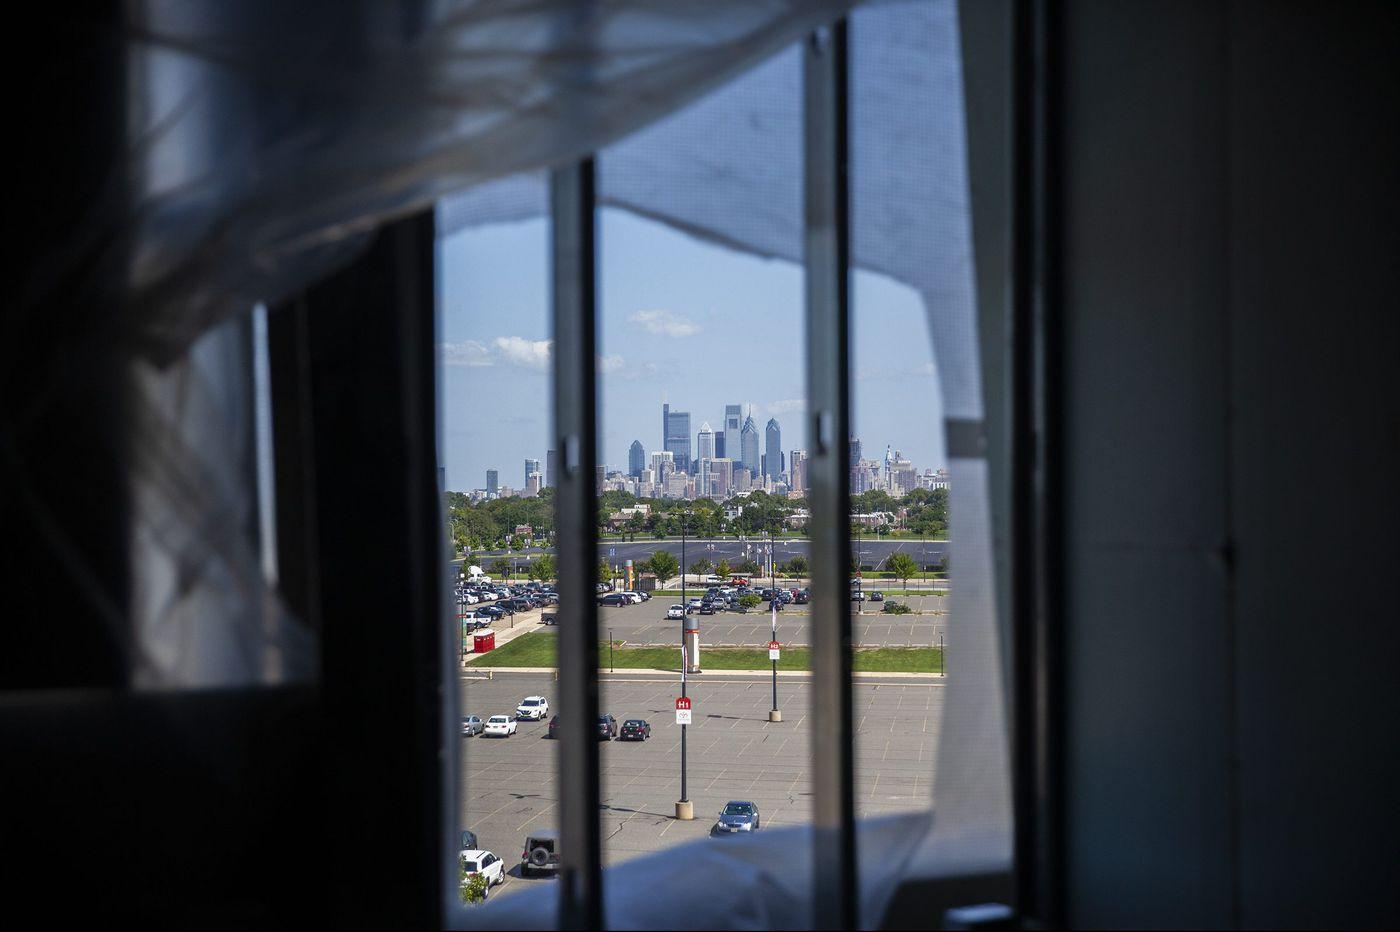 After upgrades, the Wells Fargo Center opens a new horizon